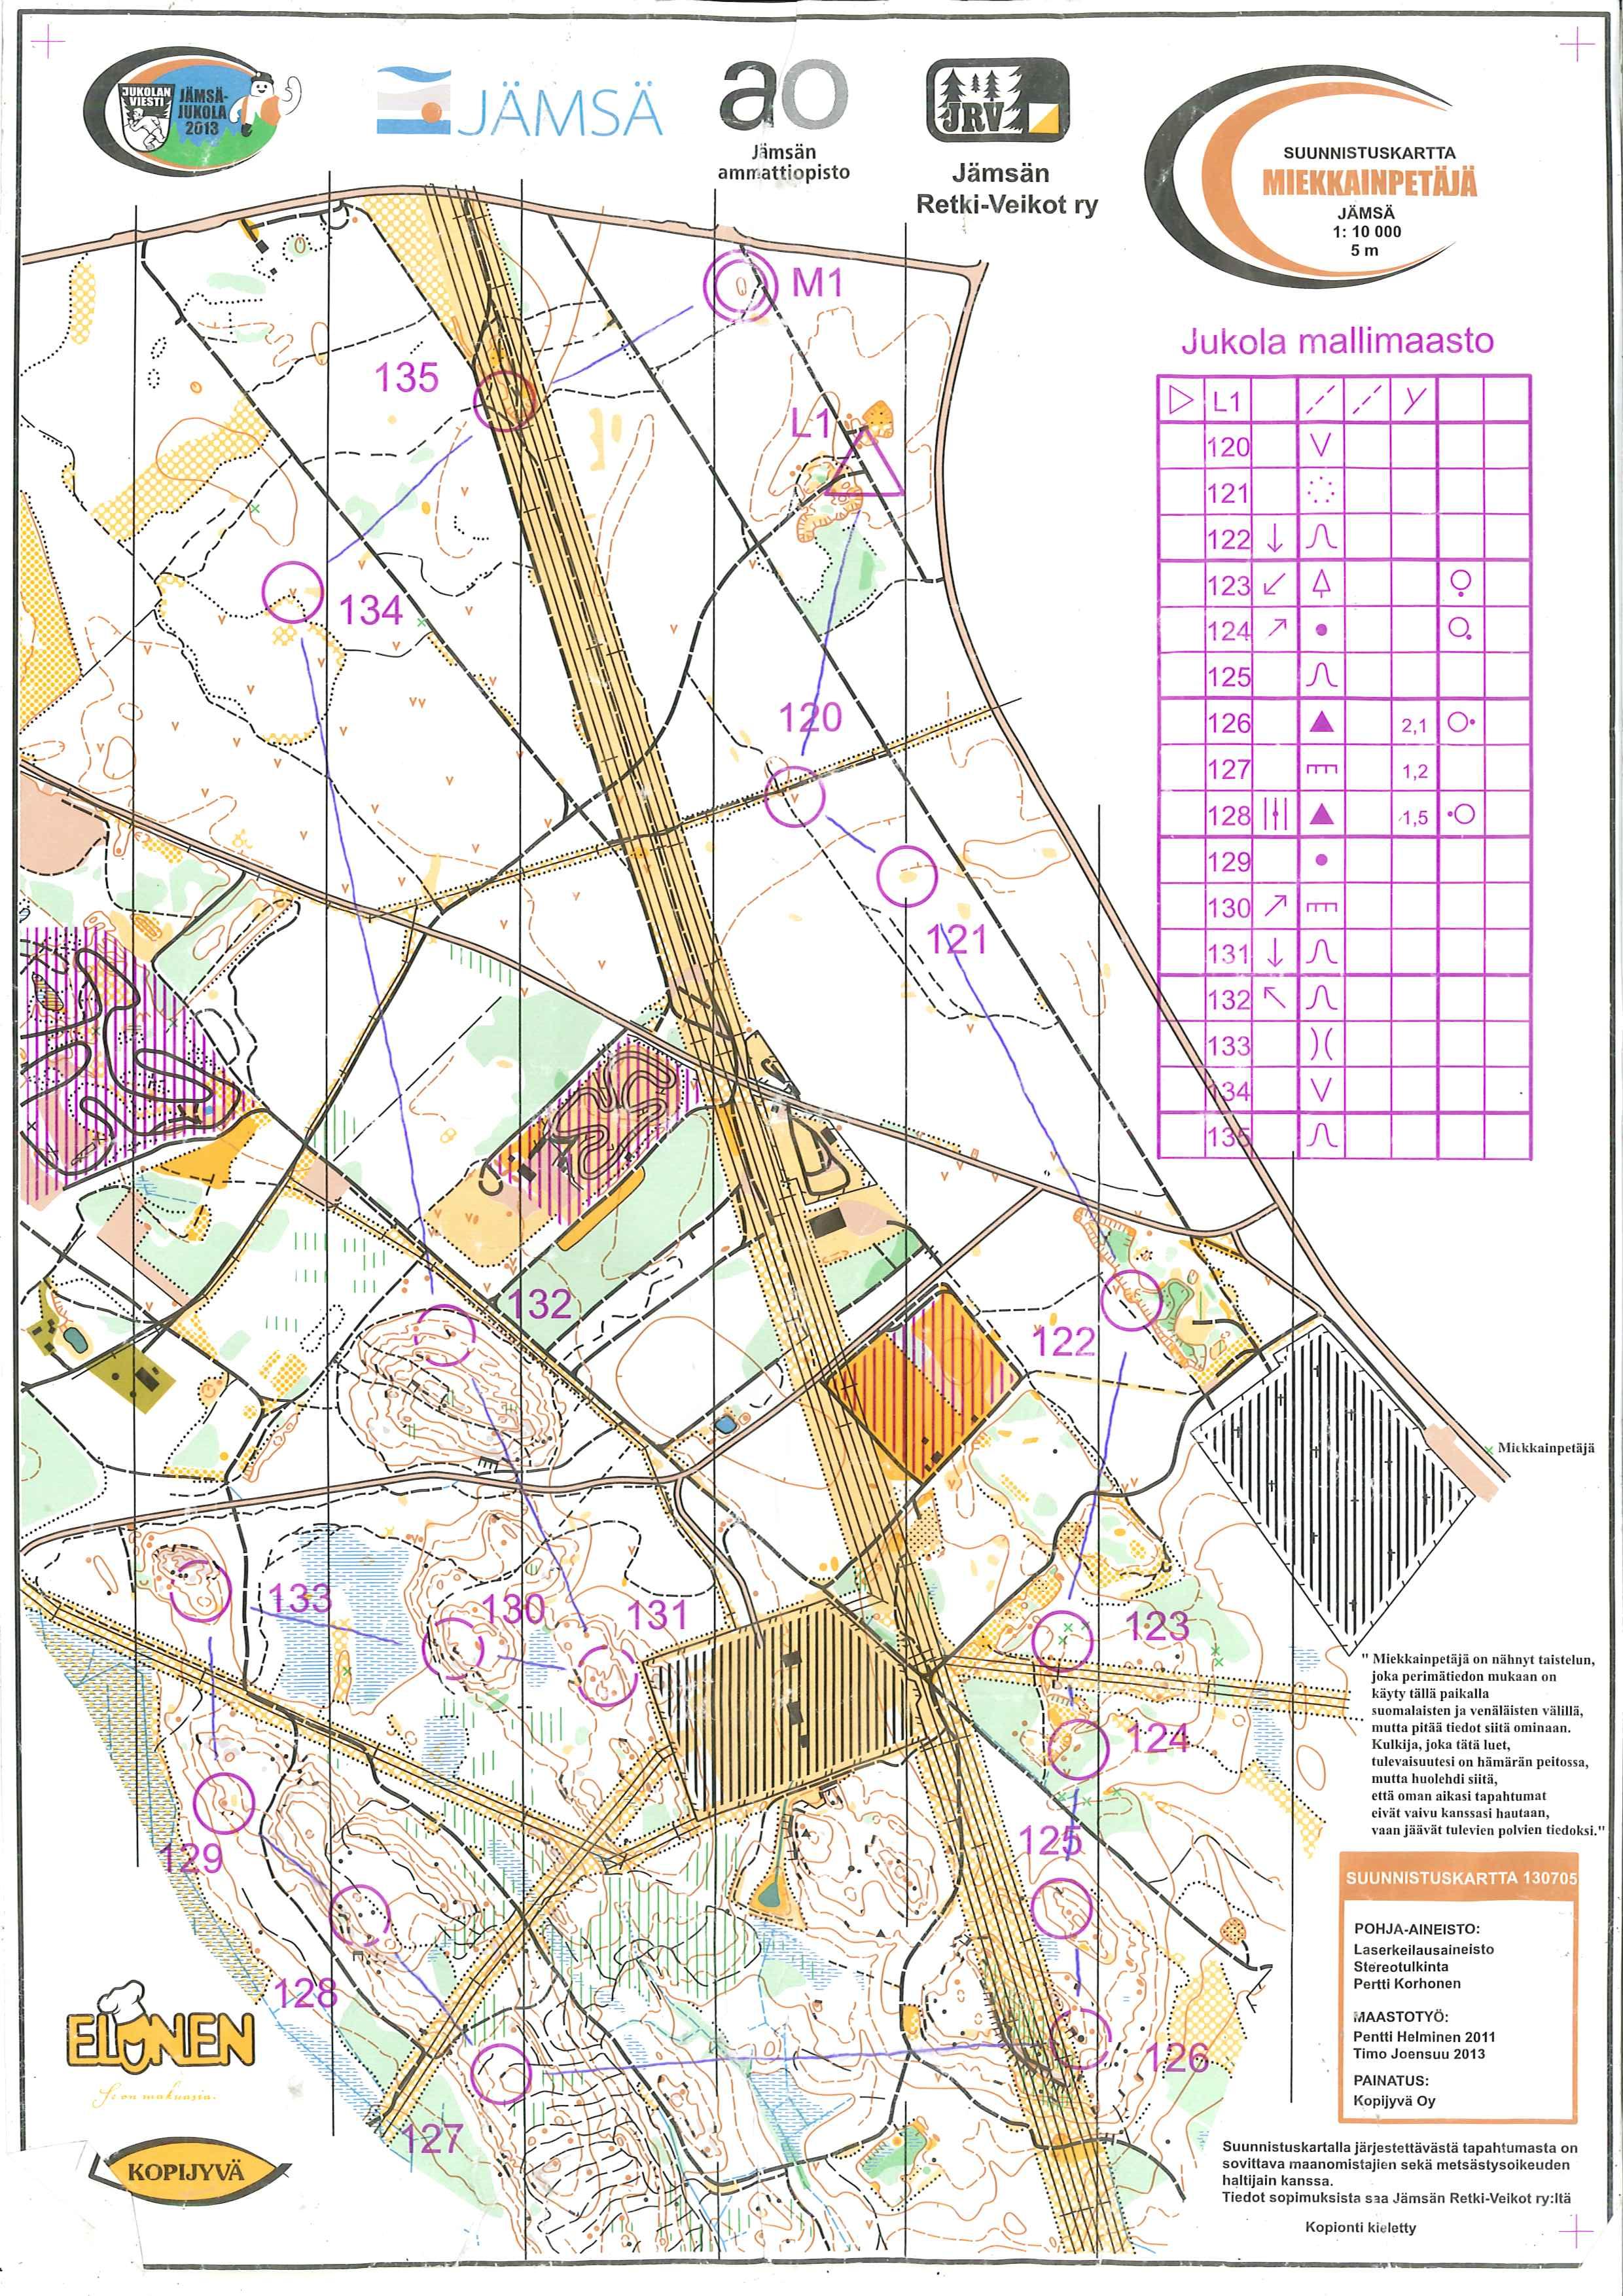 Jukolatrening Jms June 15th 2013 Orienteering Map from Anders